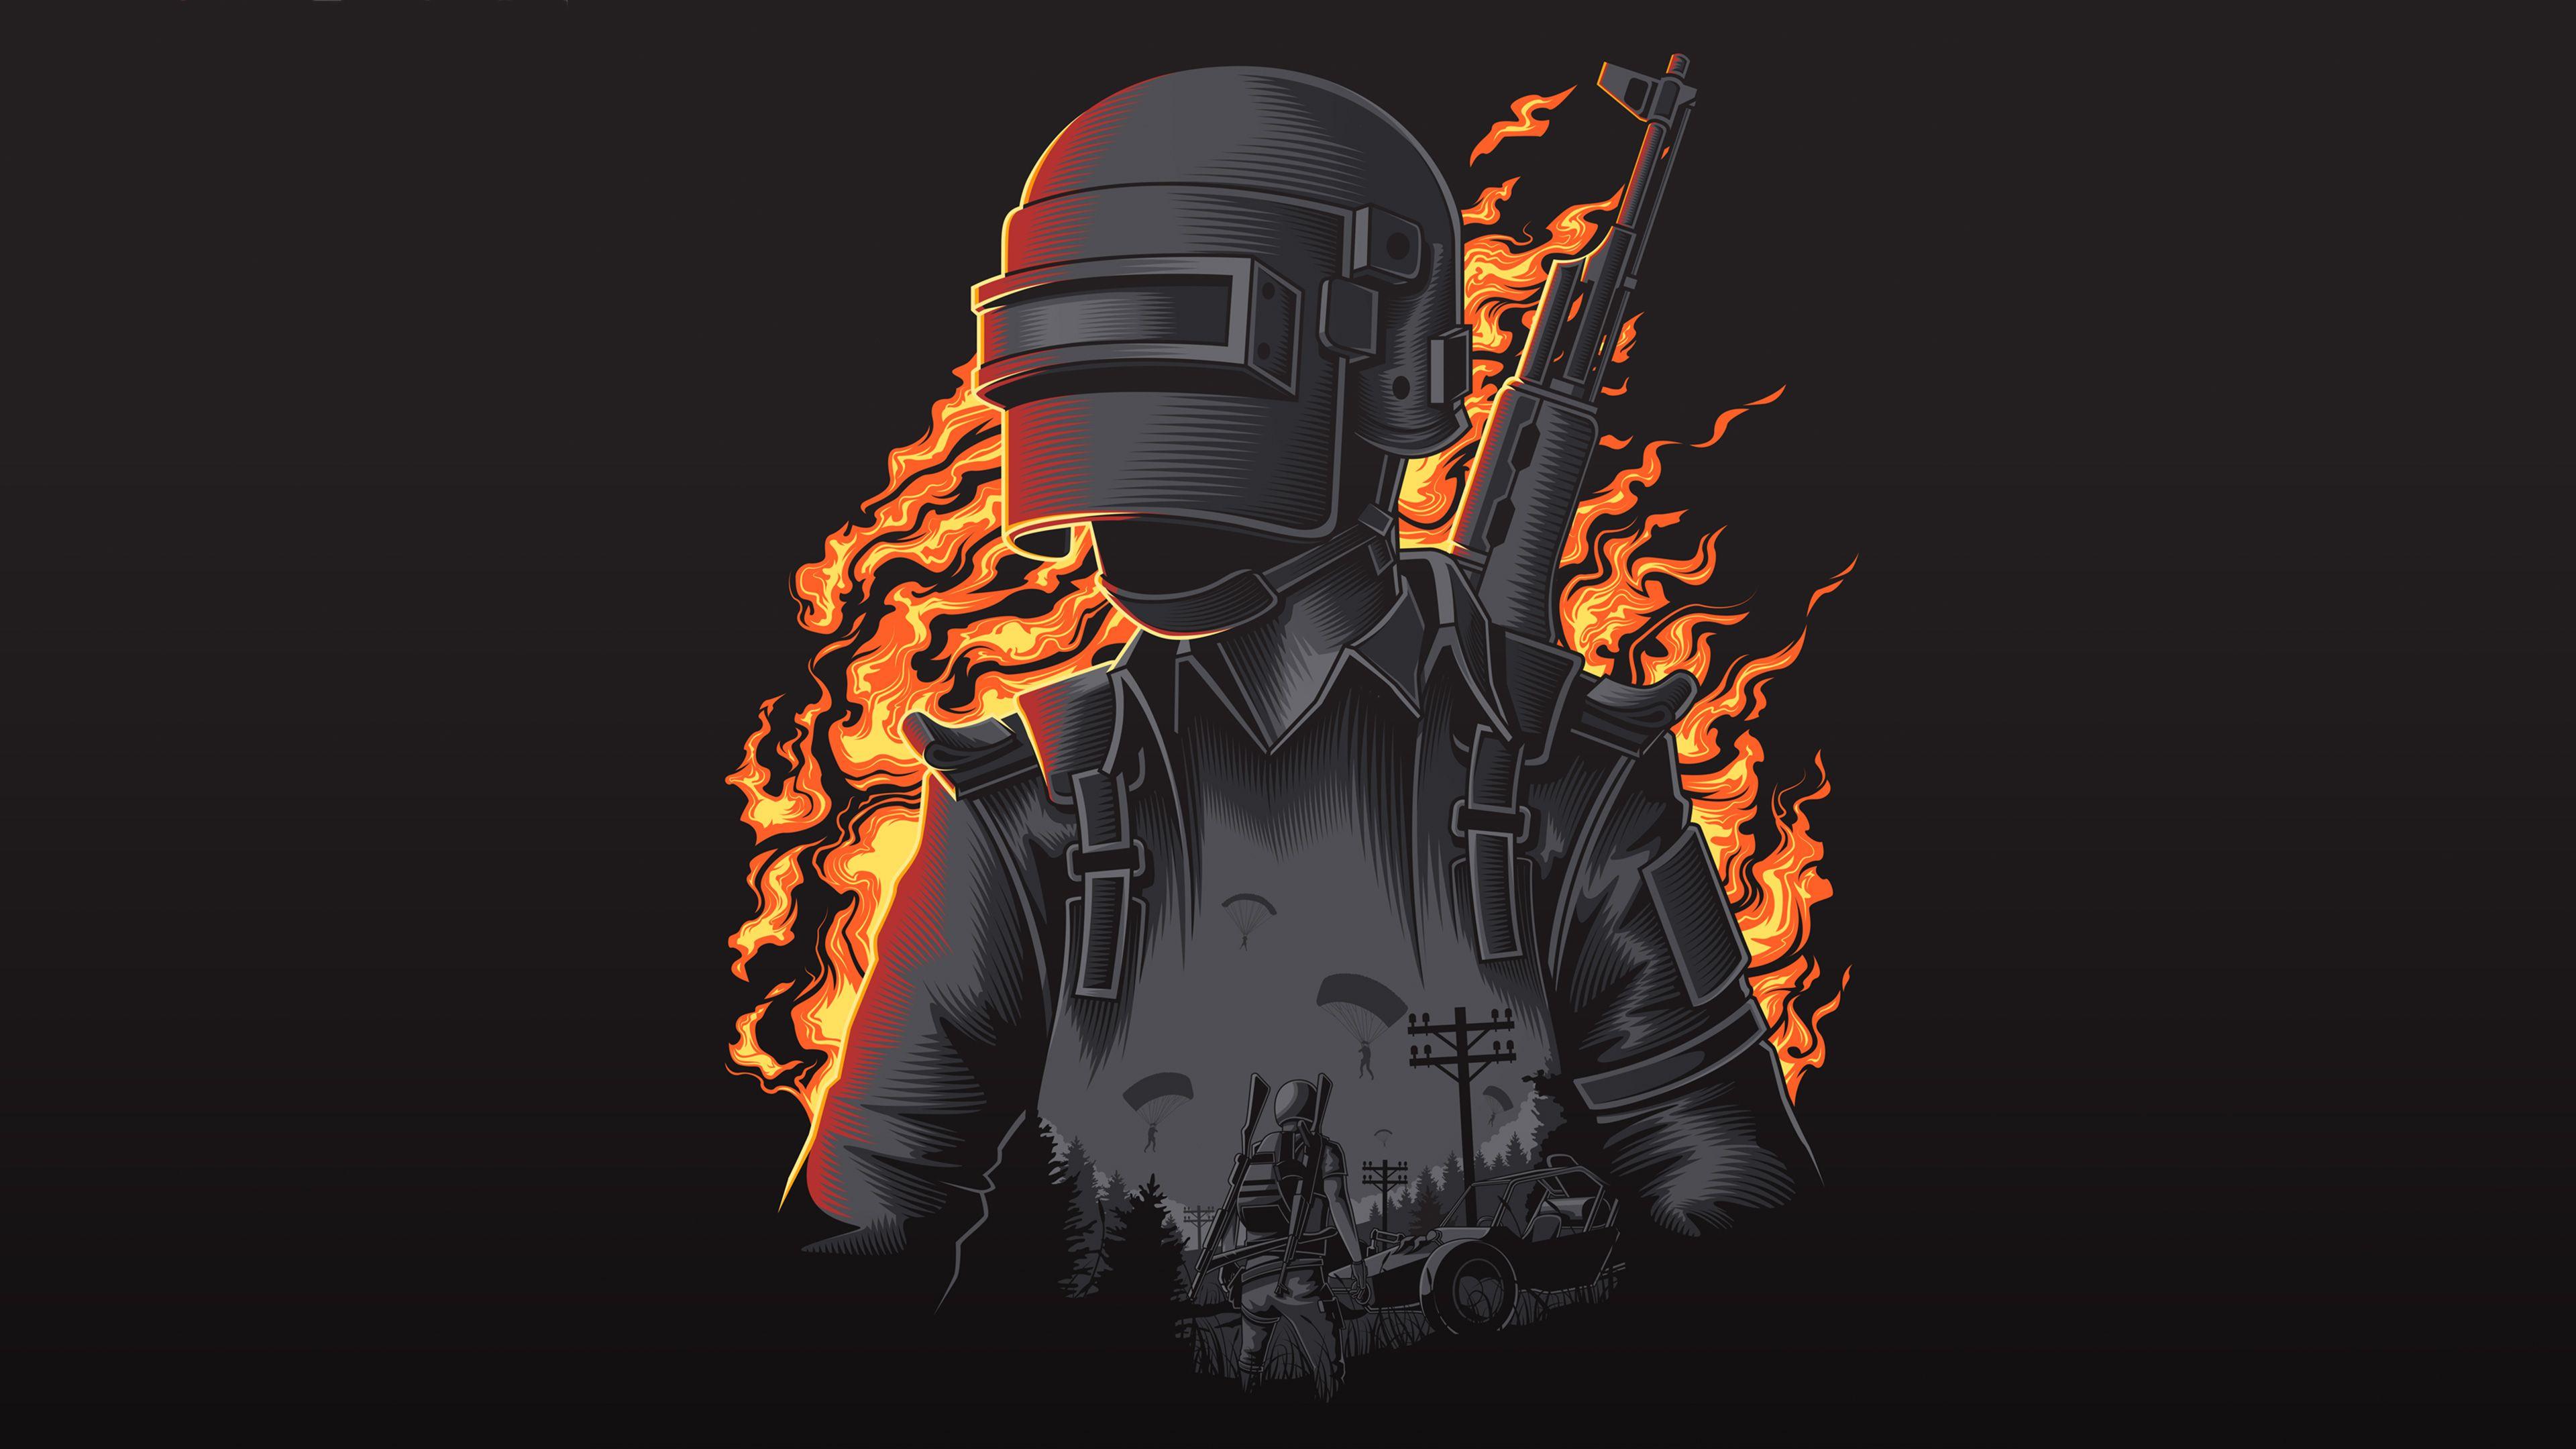 Pubg Illustration 4k Pubg Wallpapers Playerunknowns Battlegrounds